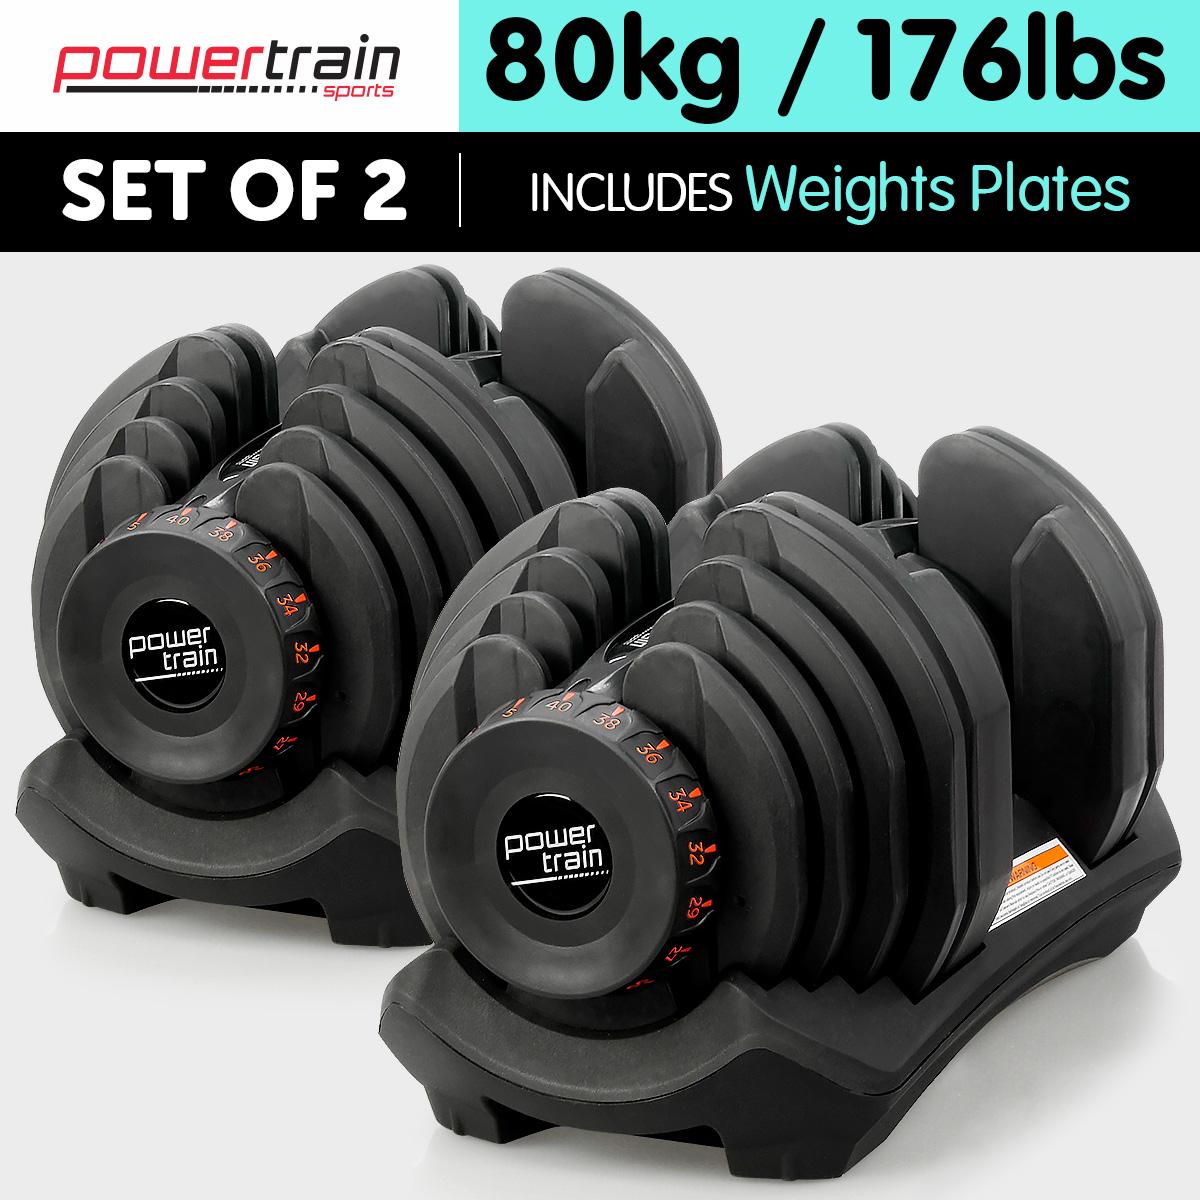 New adjustable dumbbells set home gym exercise equipment